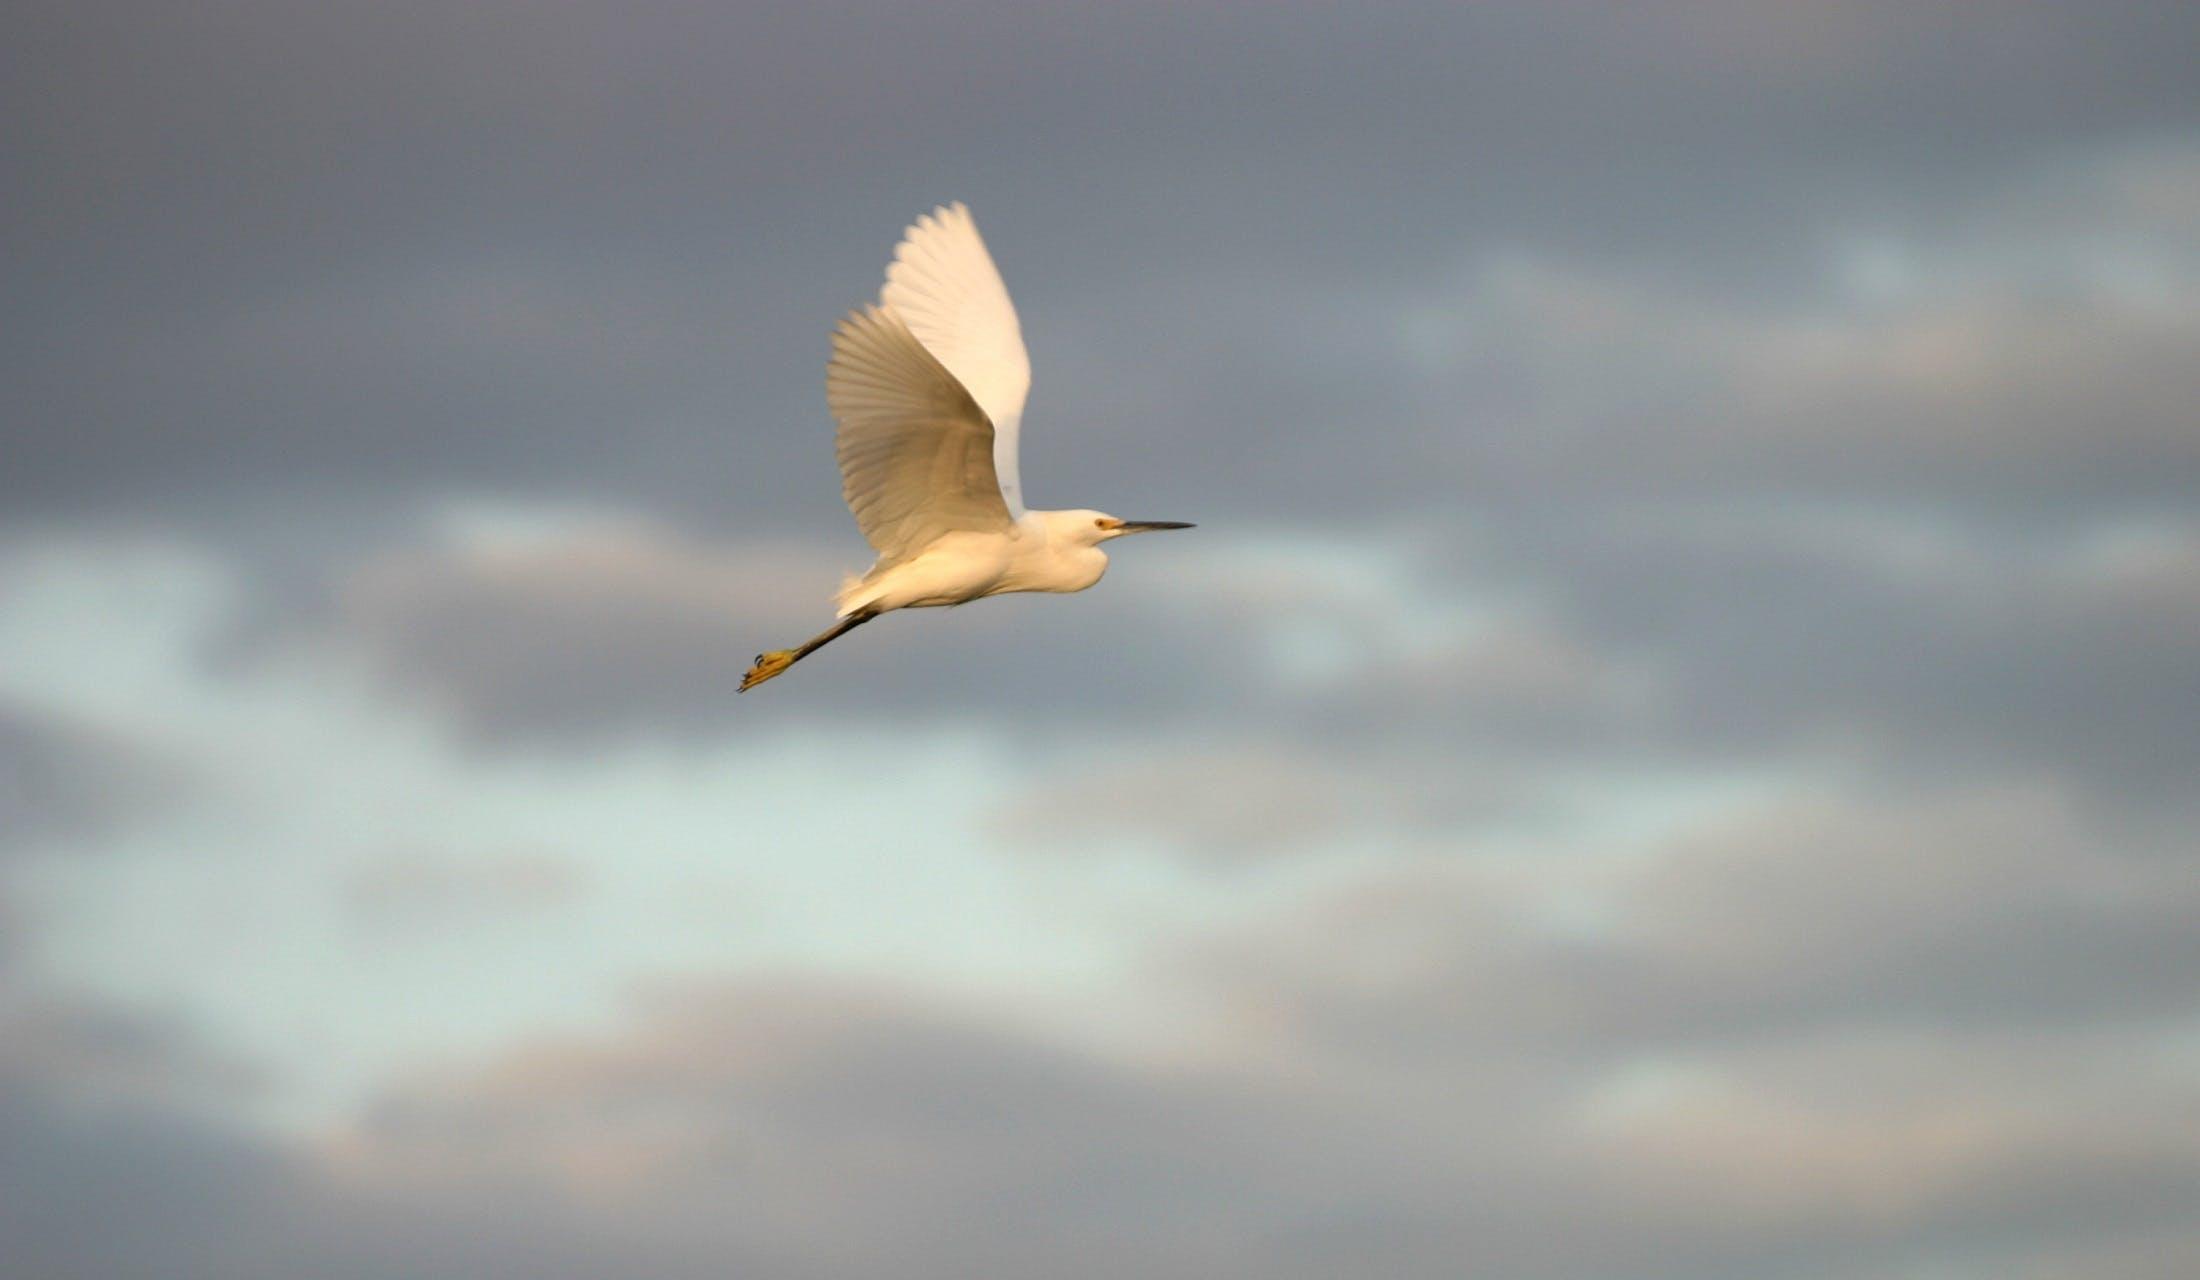 Fotos de stock gratuitas de alas, animal, de perfil, garceta